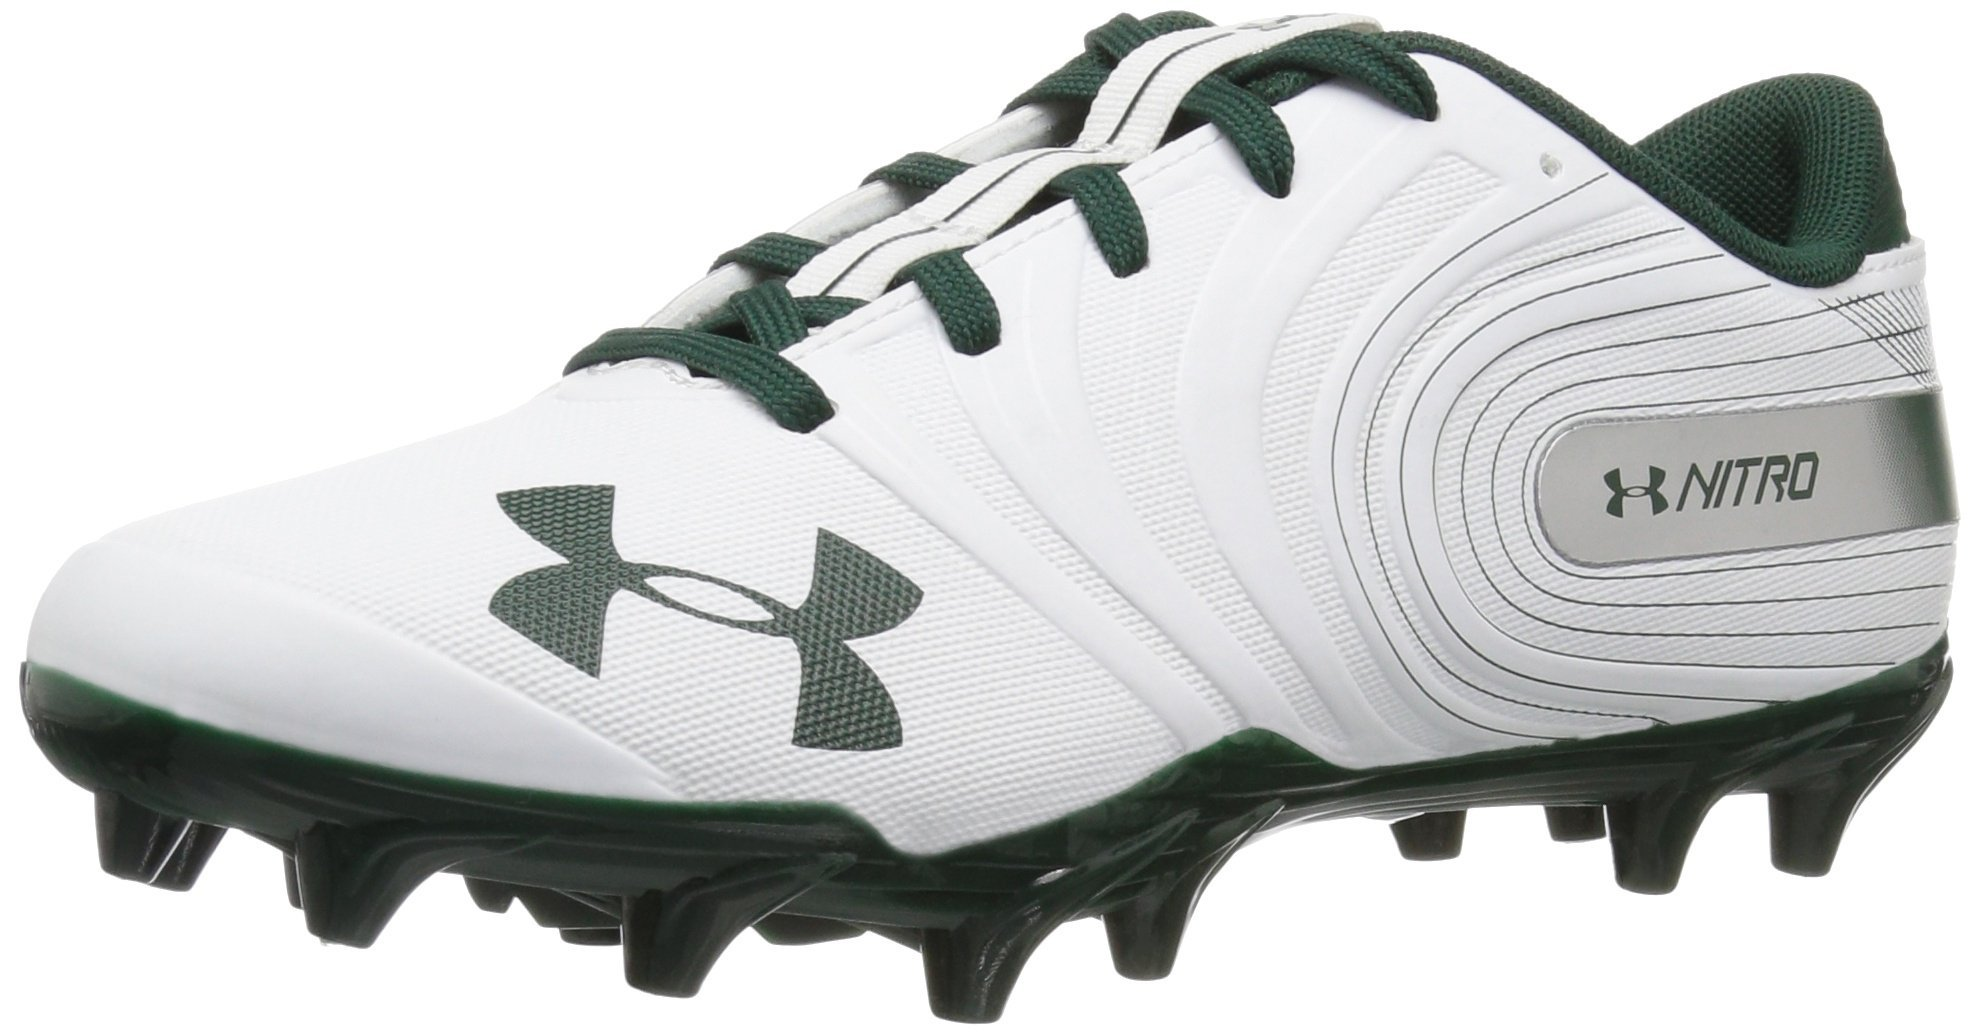 Under Armour Men's Nitro Low MC Football Shoe, White (102)/Forest Green, 6.5